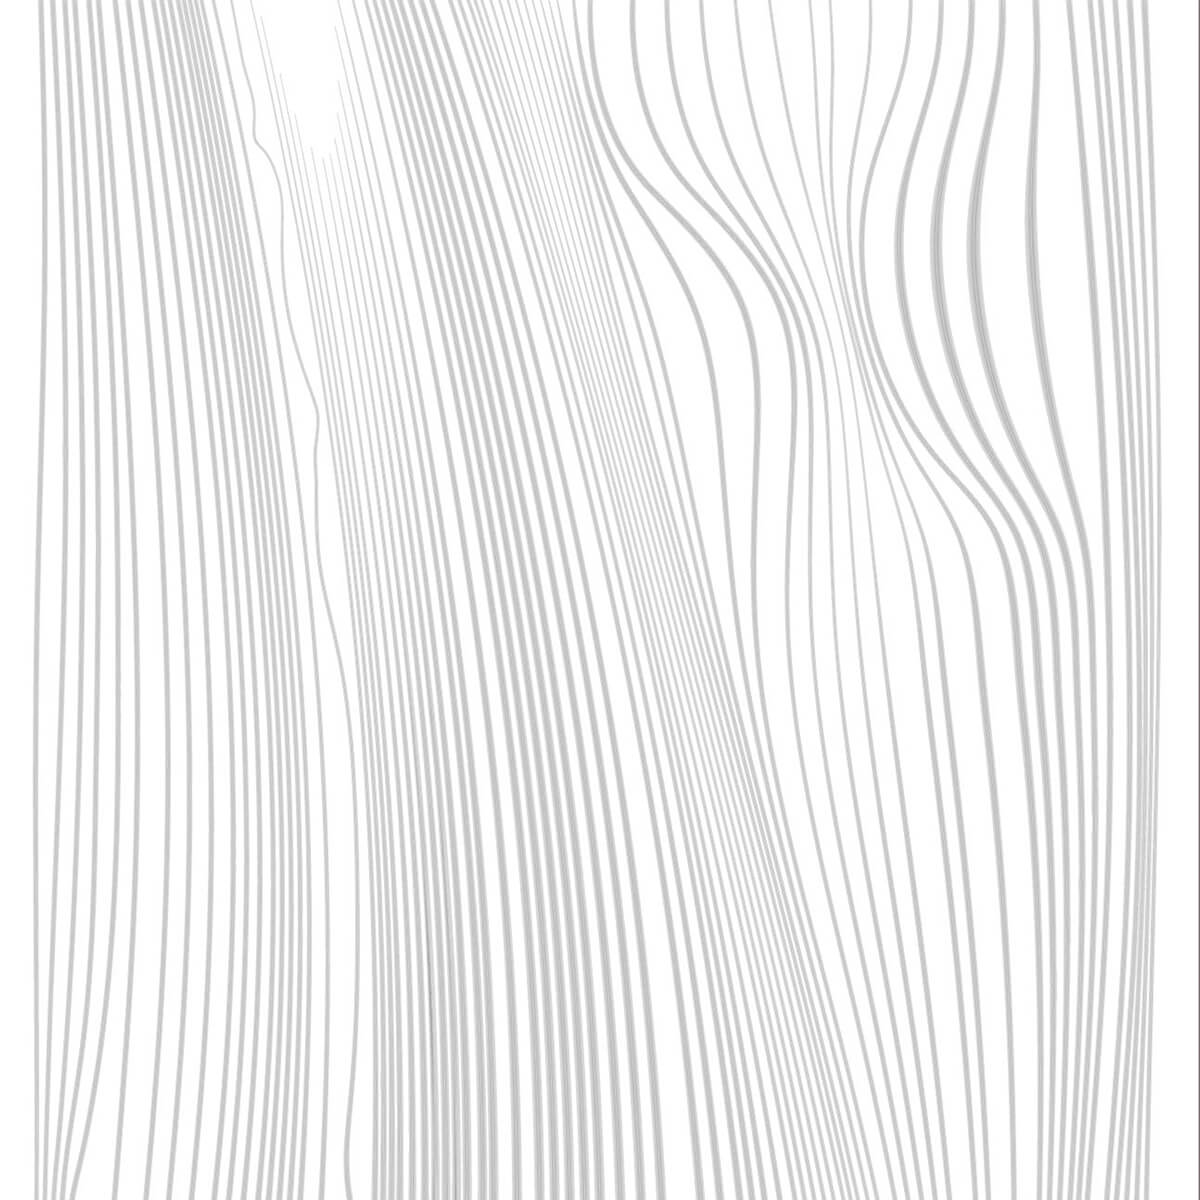 corian textured surfaces david thomas artist collection bole line drawing